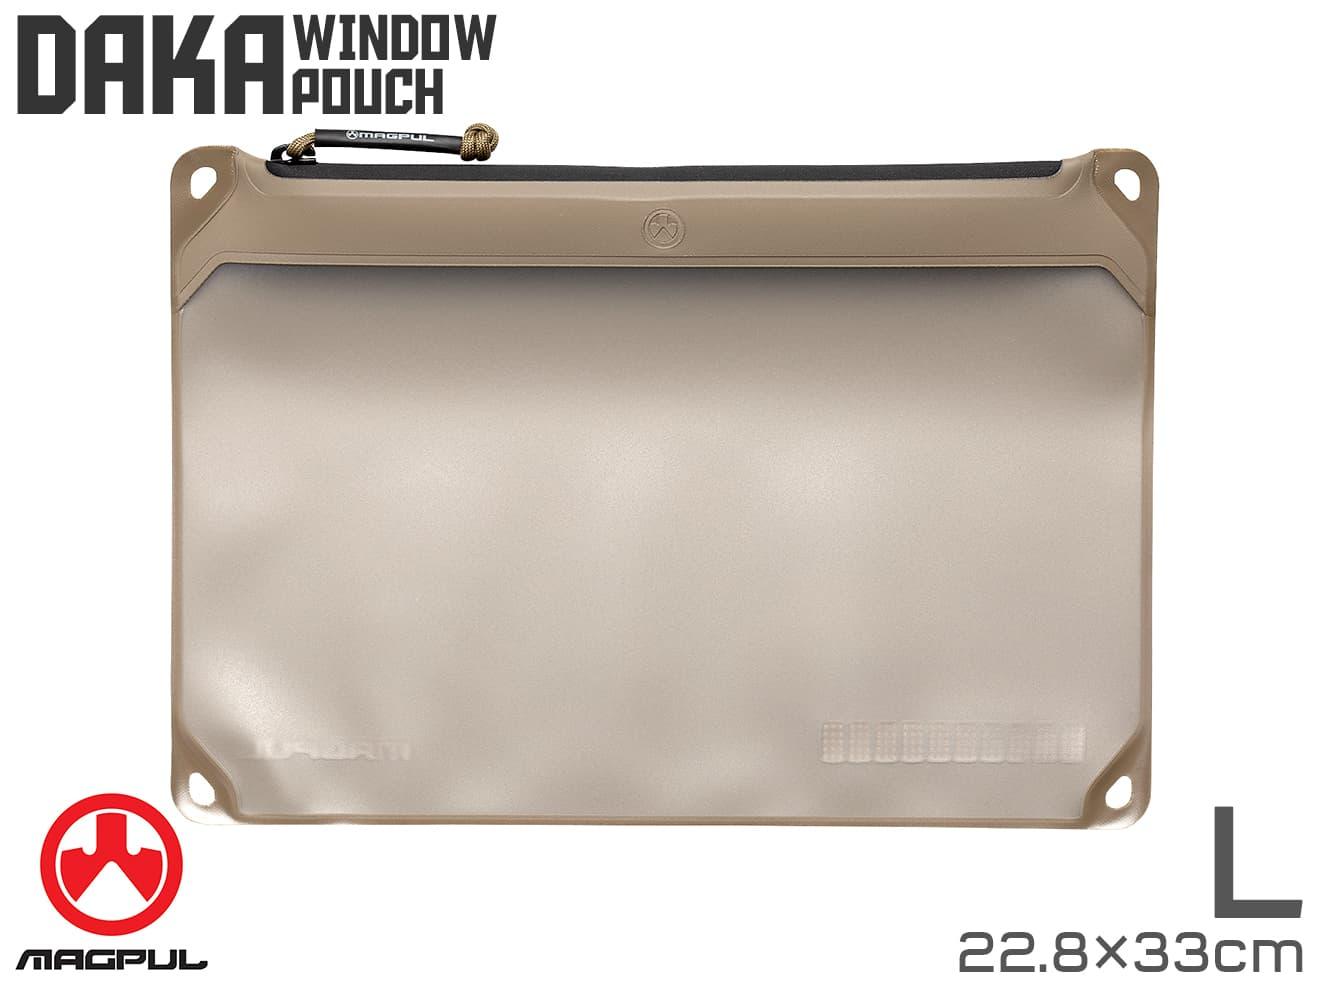 Magpul DAKA Window ポーチ L[22.8cm×33cm] FDE◆マグプル ダカポーチ 半透明窓 MA356554313 汚れに強い 精密部品/パーツ類などの保管に